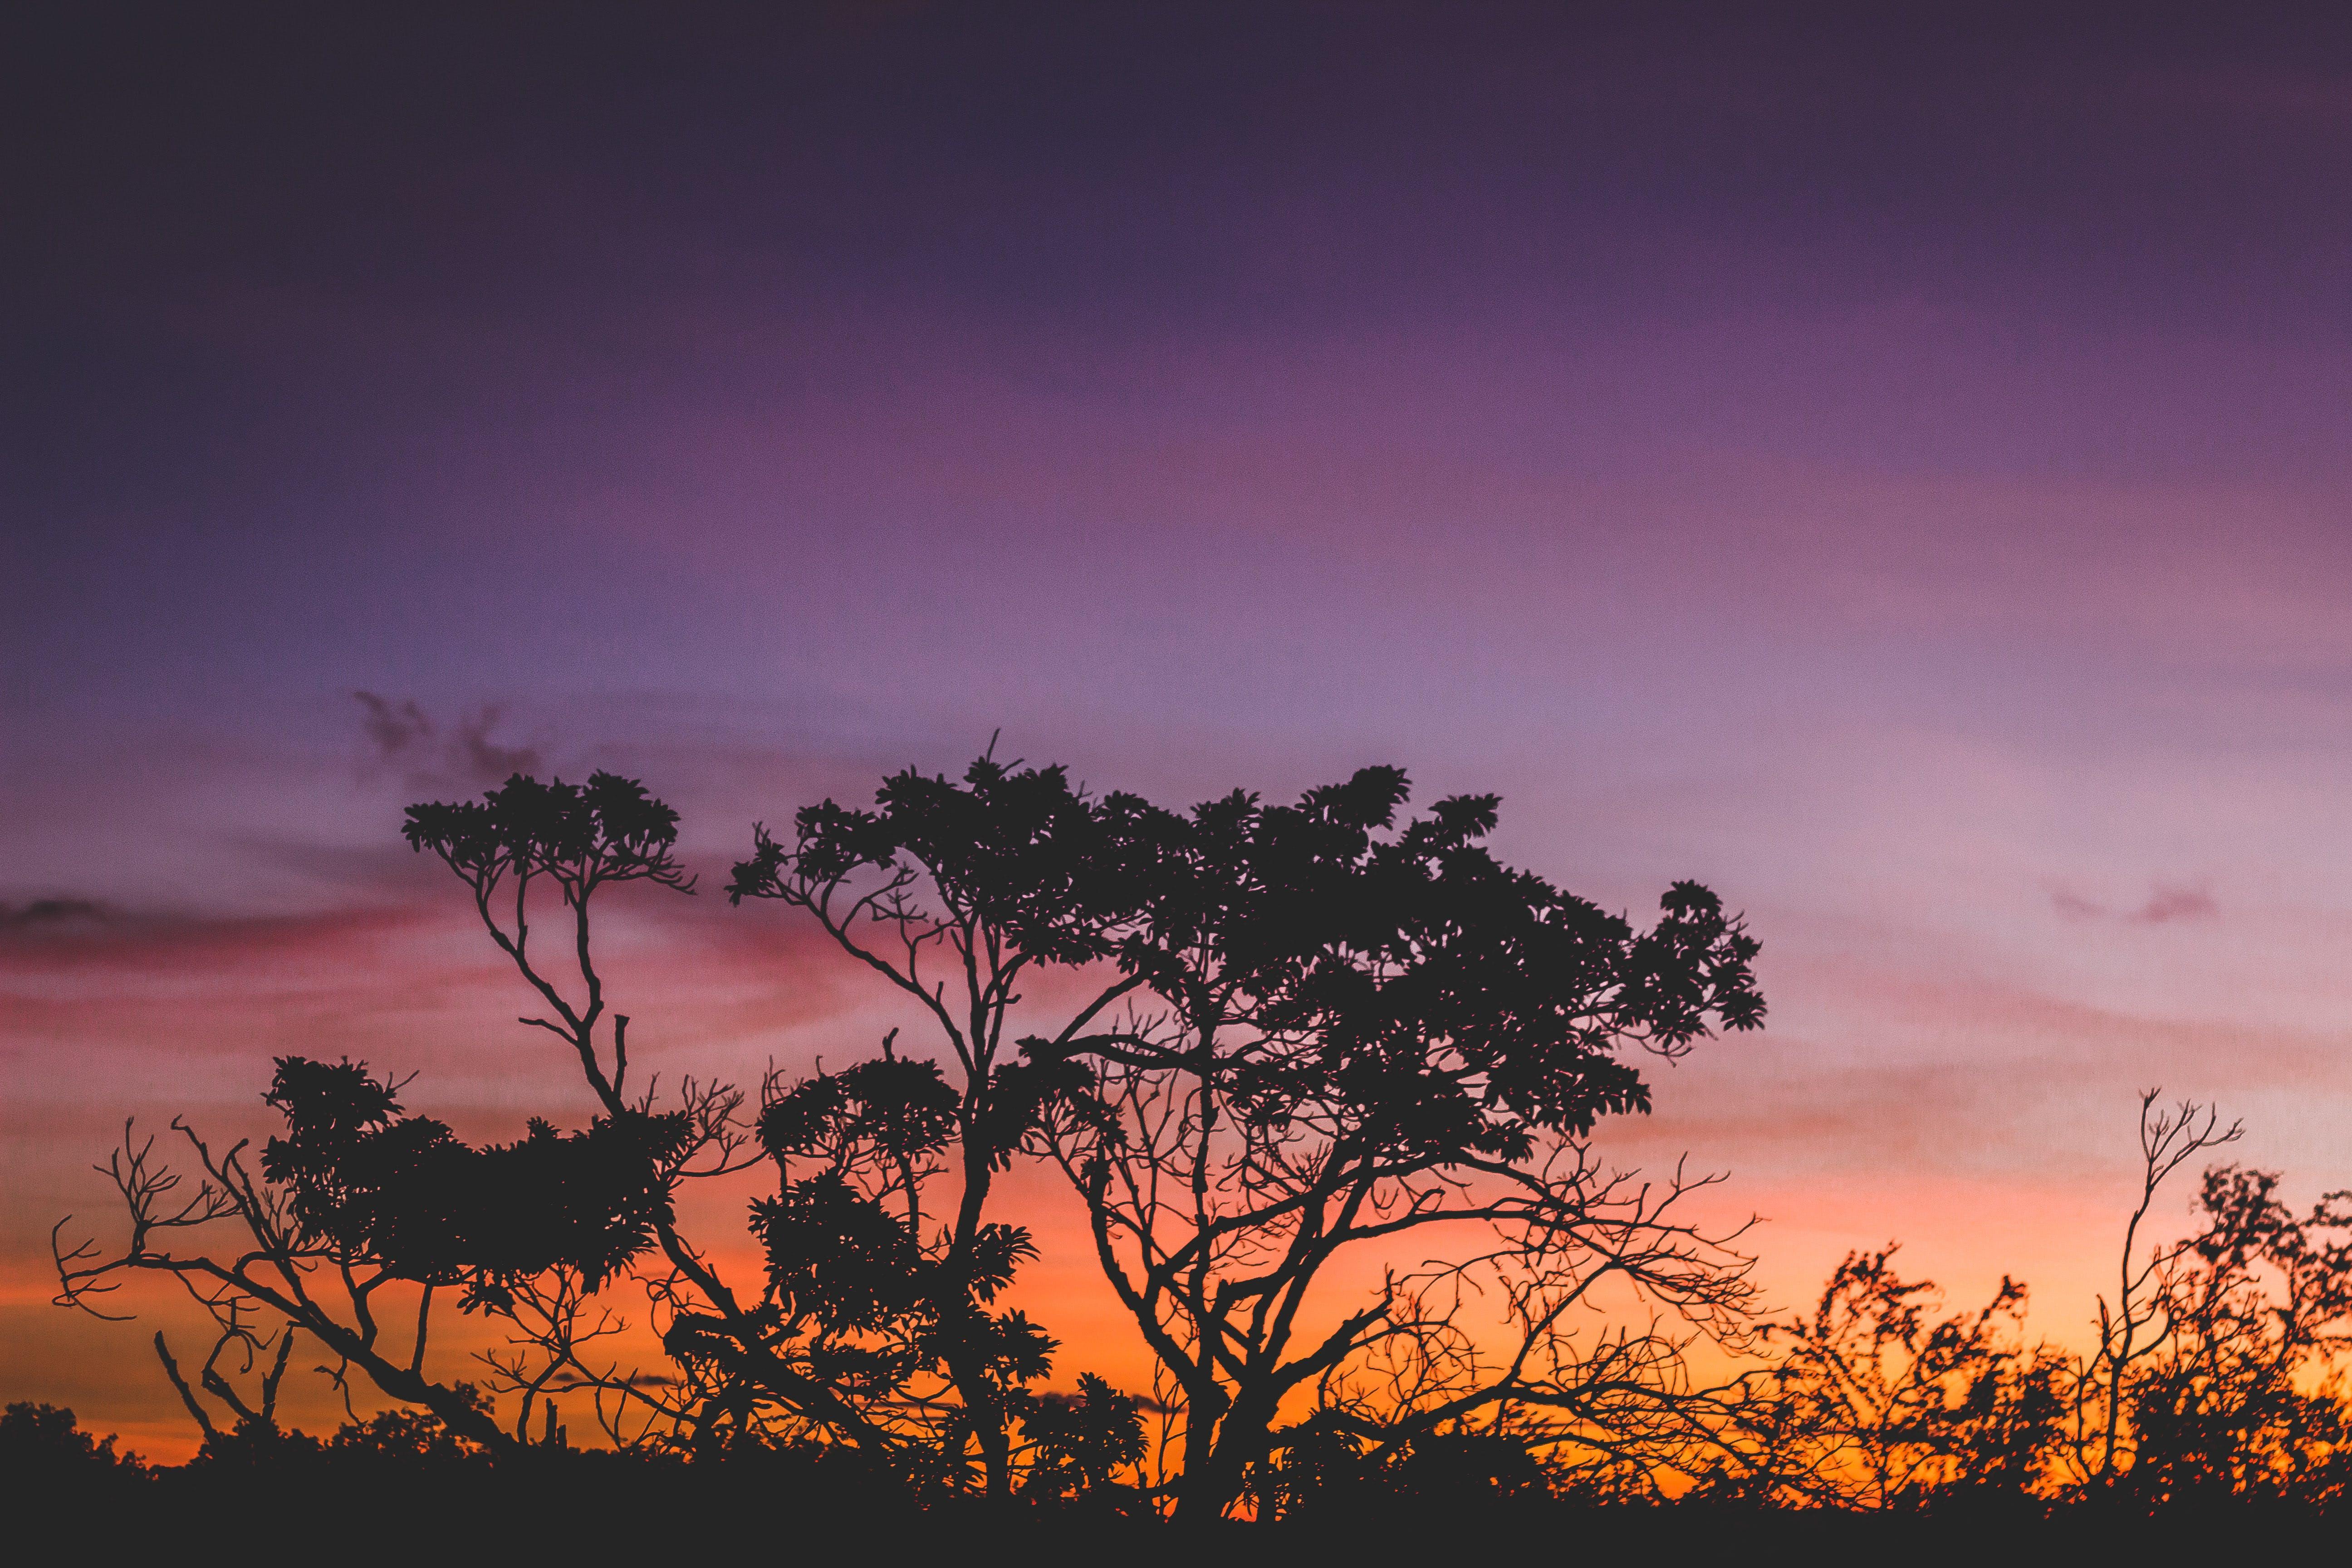 Silhouette of Tree during Orange Sunset